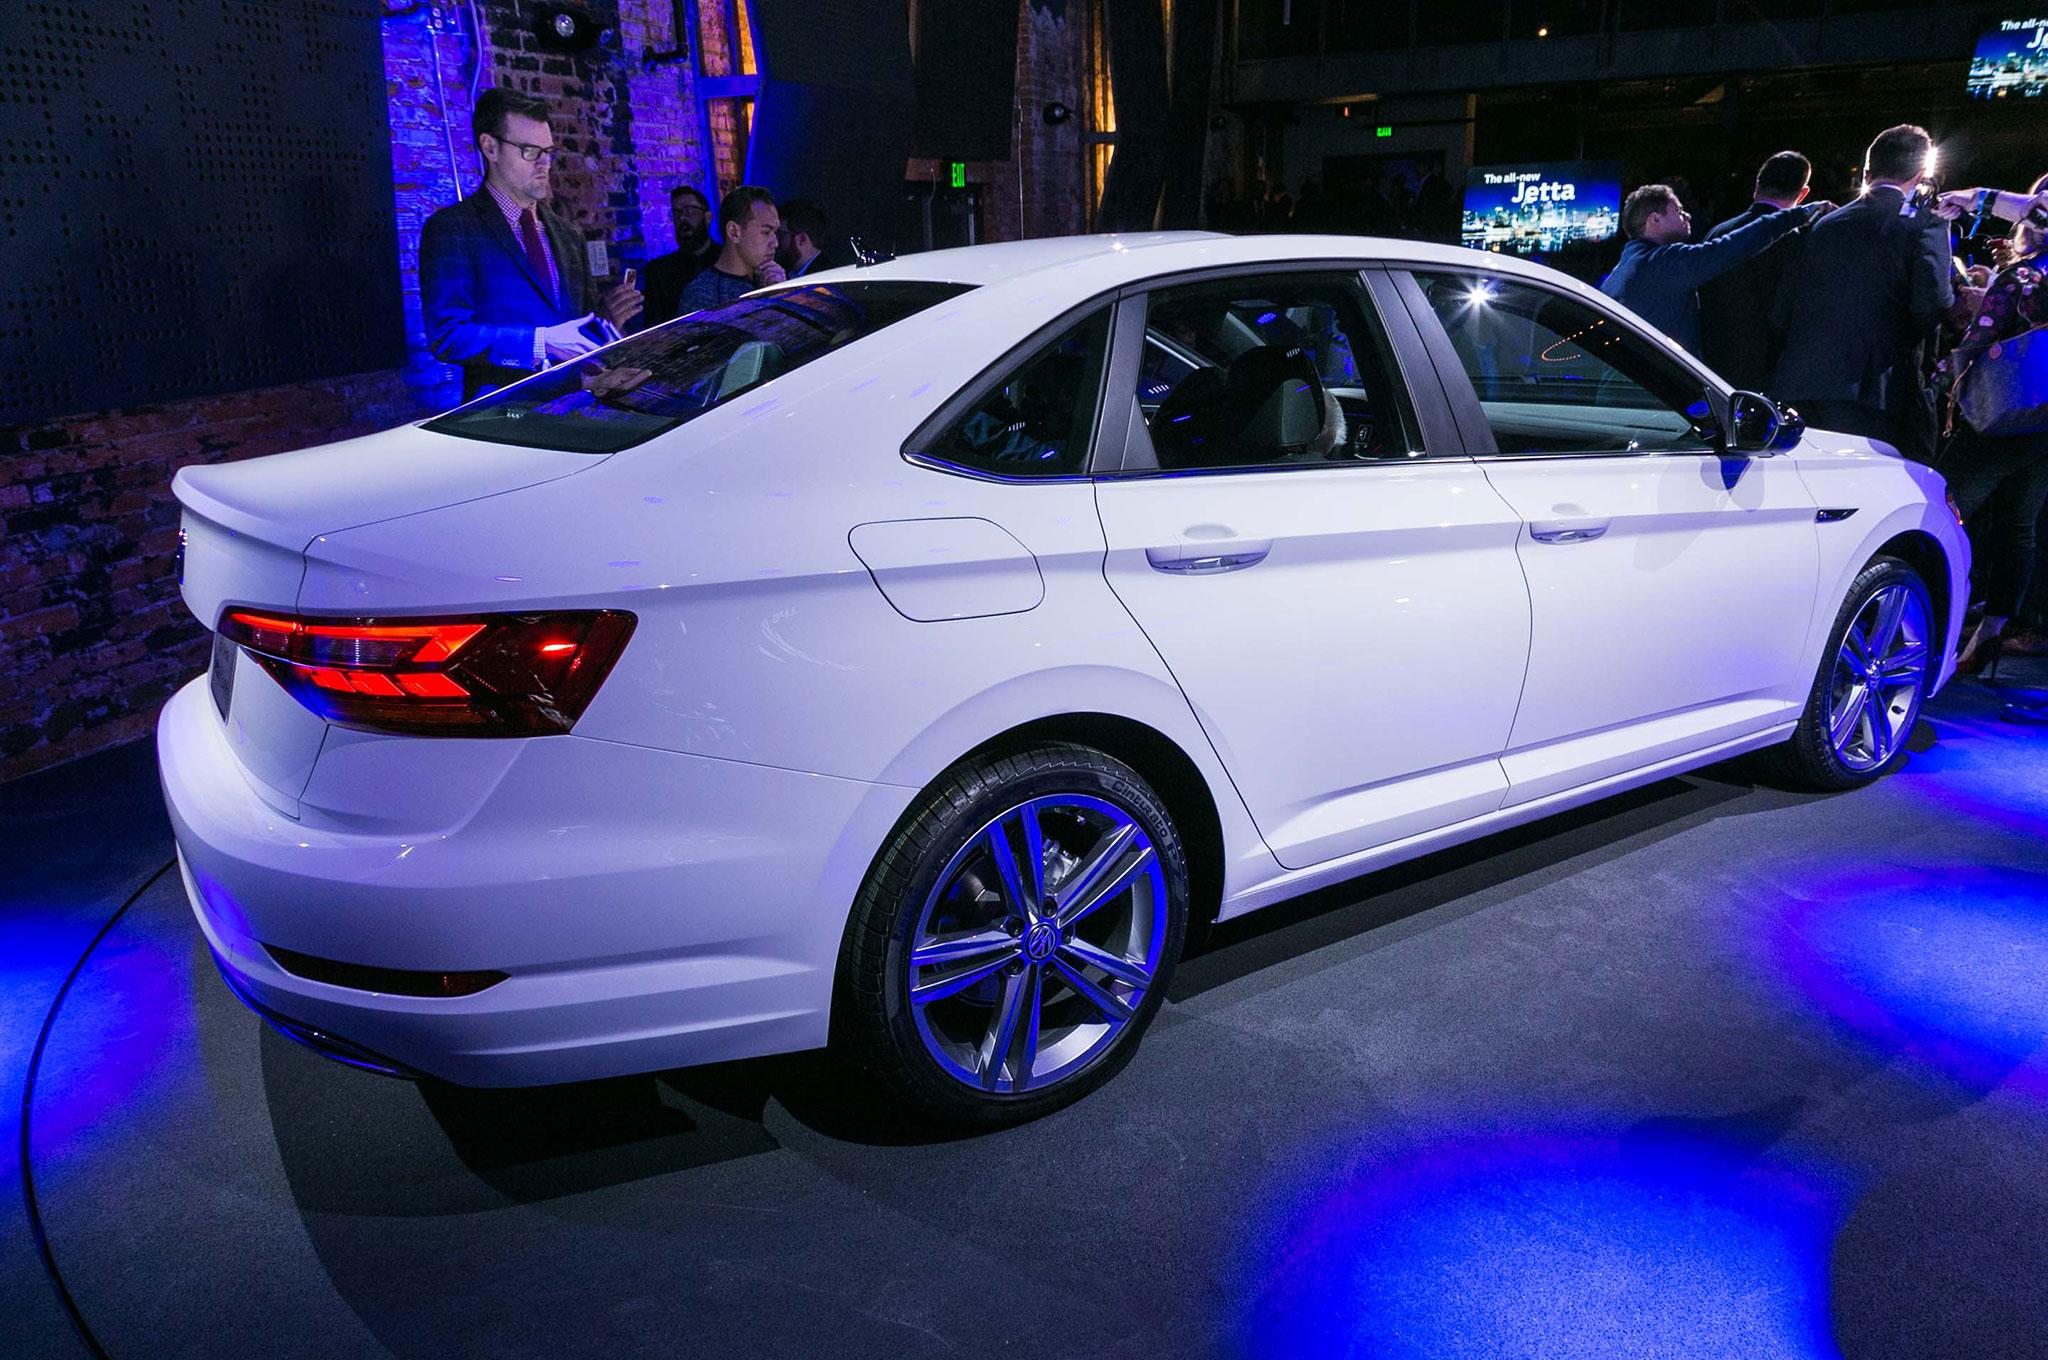 2019 Jetta >> Volkswagen Jetta 2019 entrega hasta 40 mpg - Motor Trend en Español